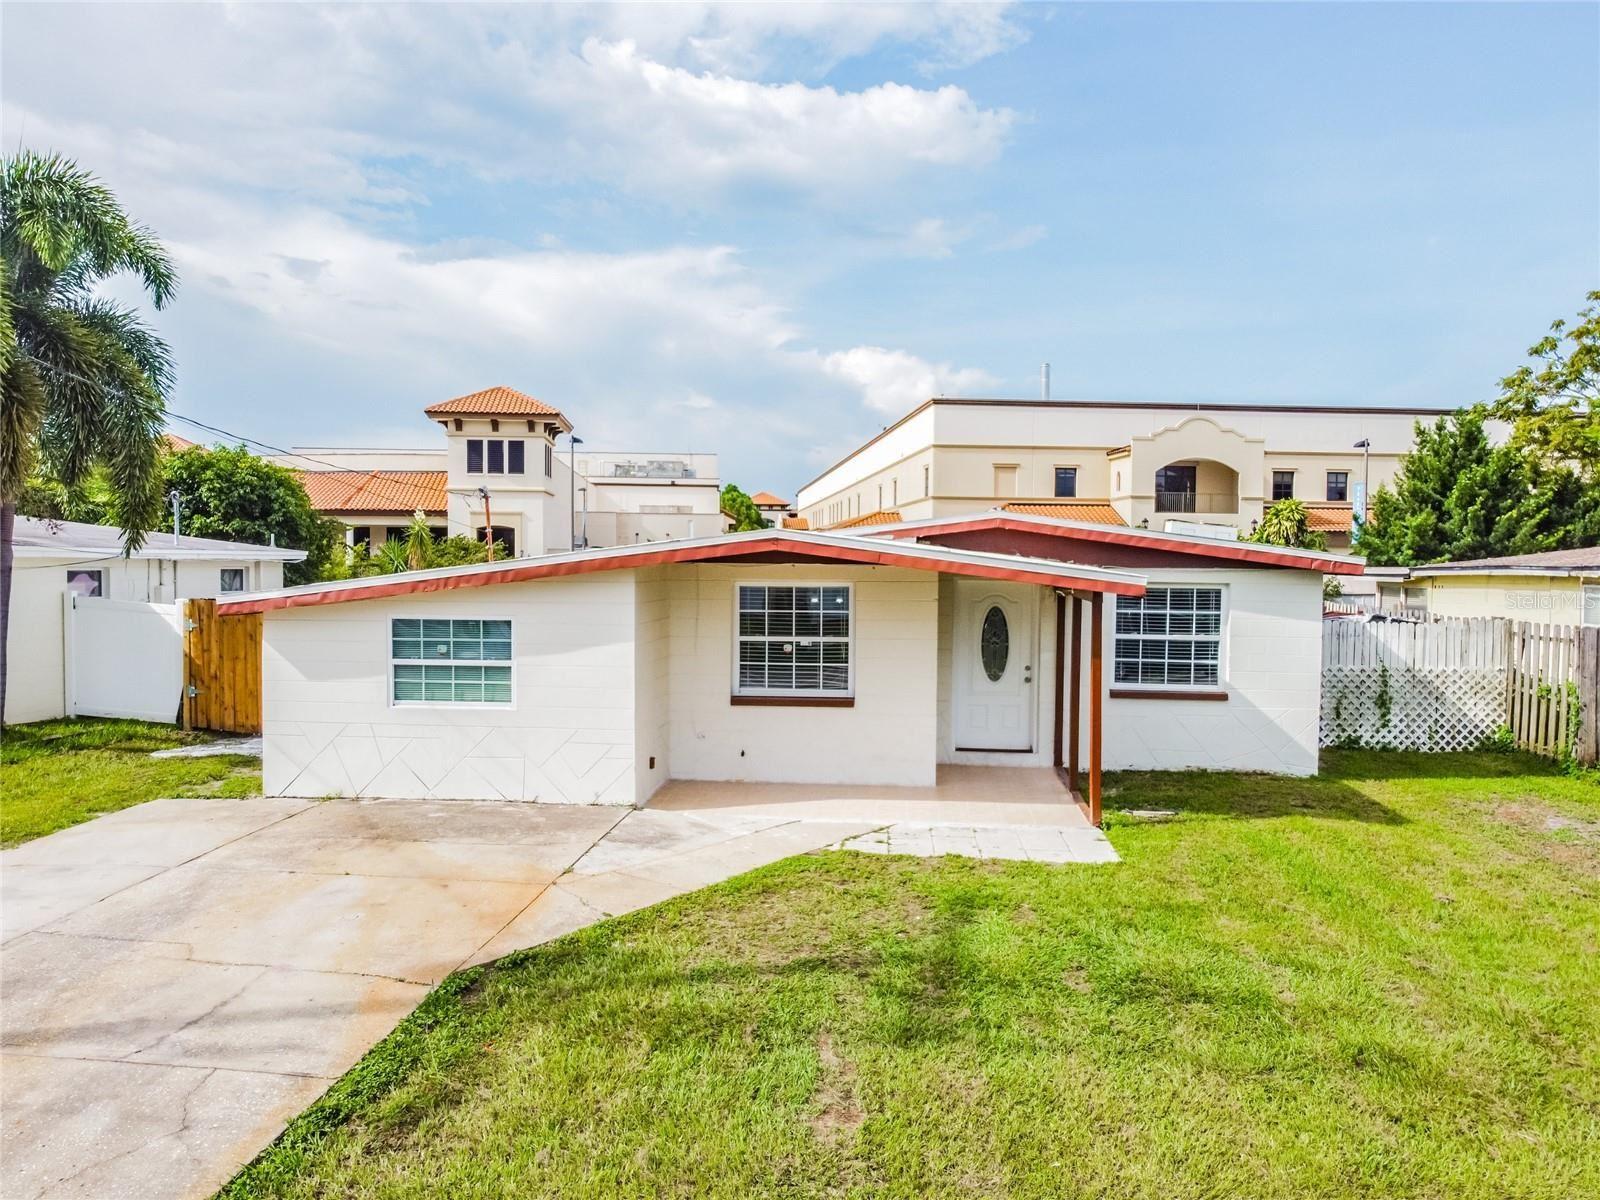 7347 BRIGHTEN DR, Tampa, FL 33615 - MLS#: T3326237